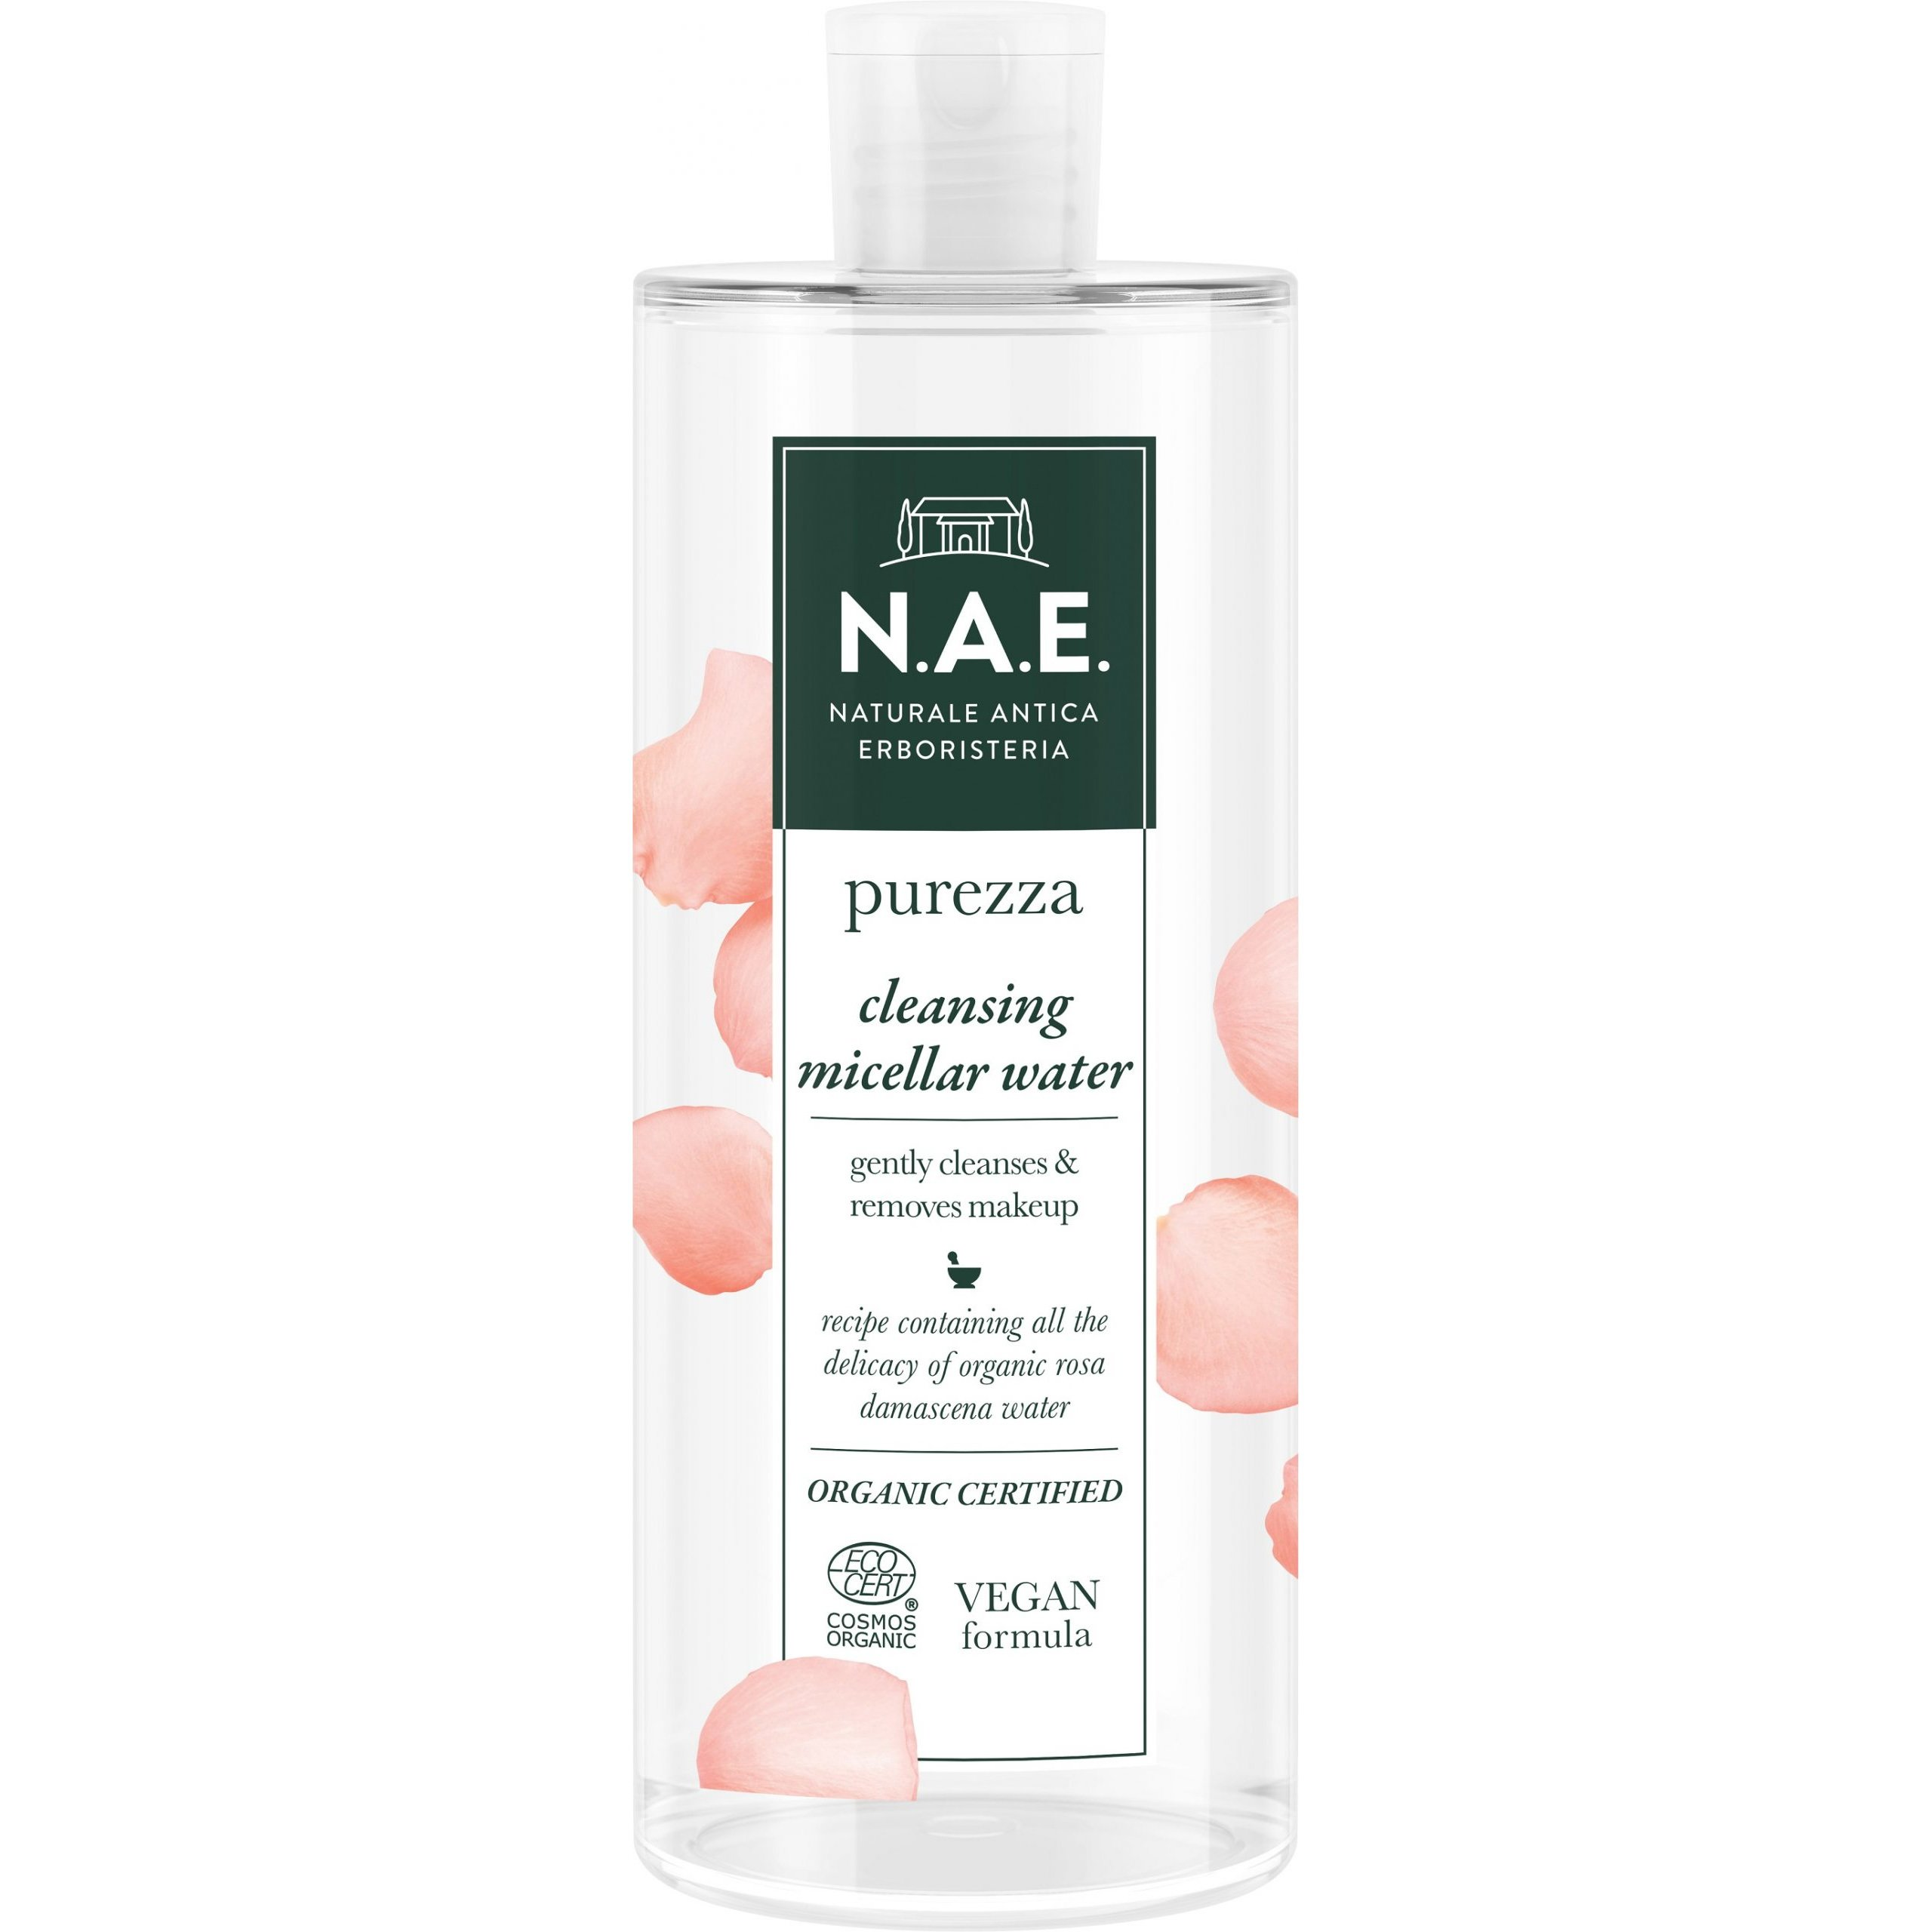 N.A.E. Purezza Gentle Micellar Water Απαλό Νερό Καθαρισμού & Ντεμακιγιάζ Προσώπου 500ml